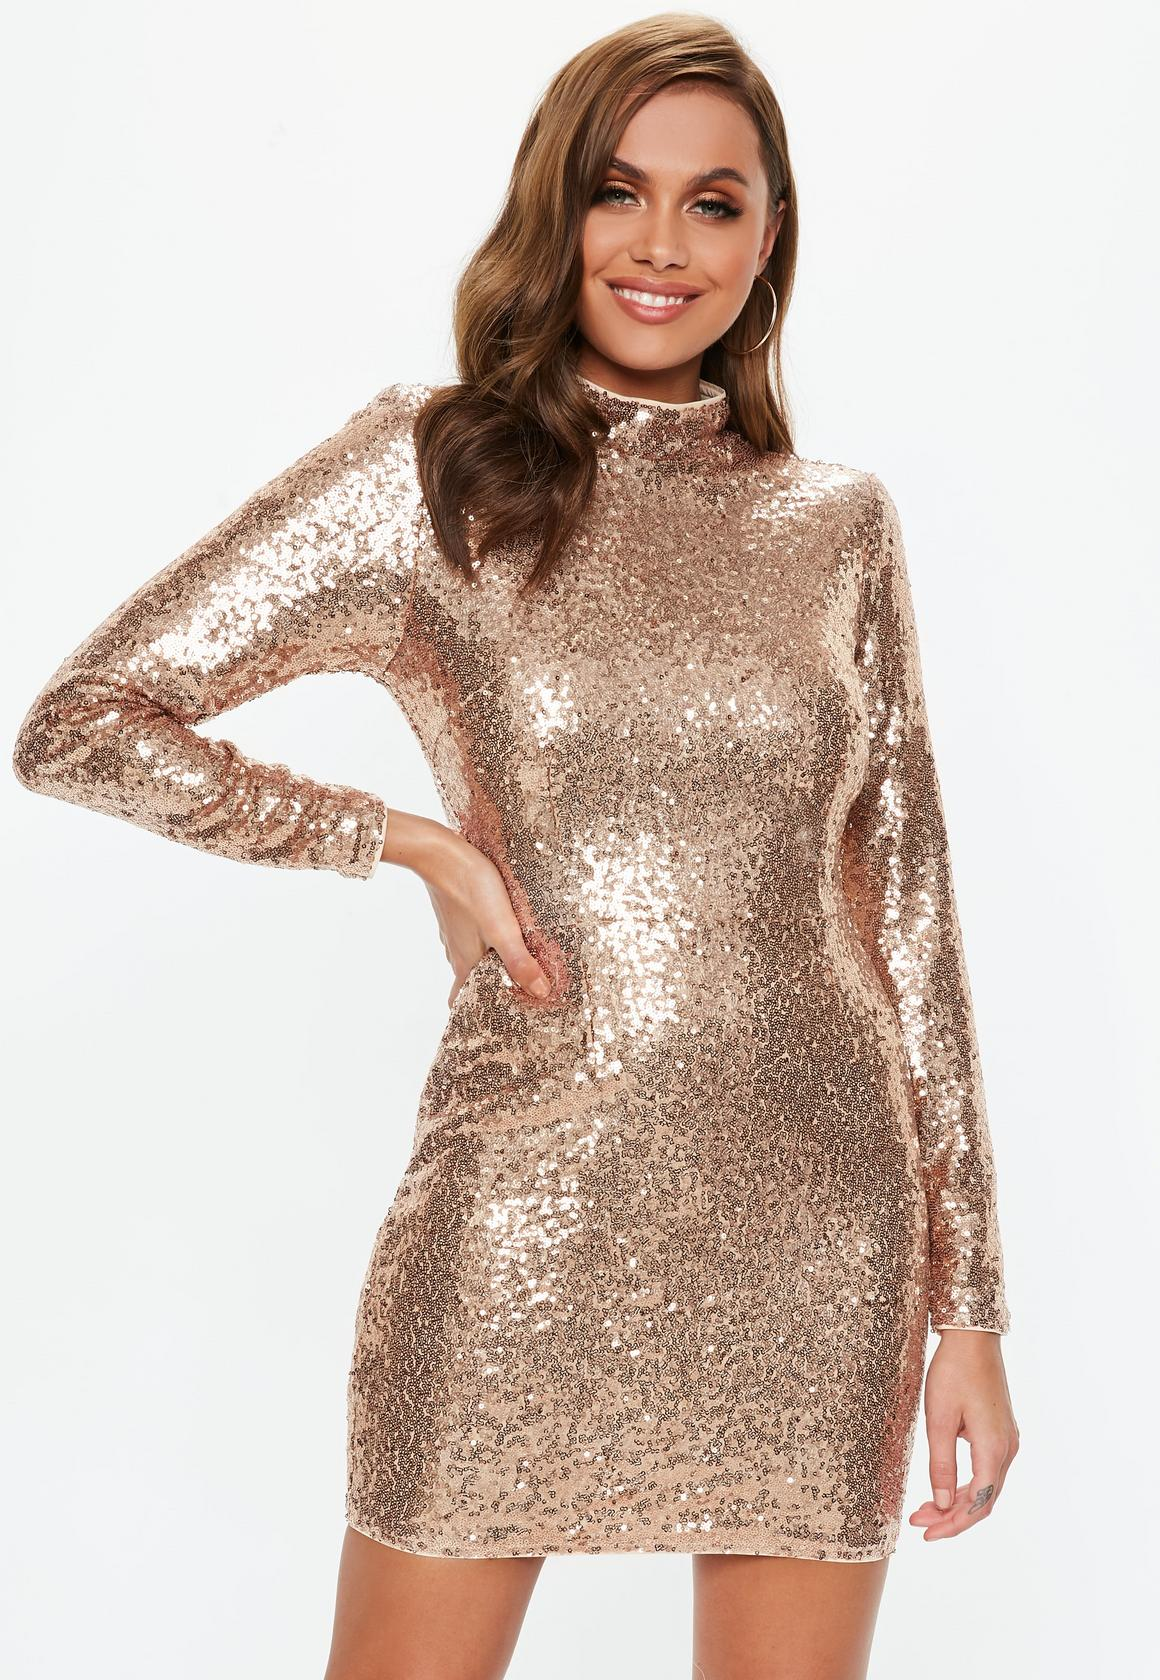 gold-high-neck-sequin-mini-dress.jpg